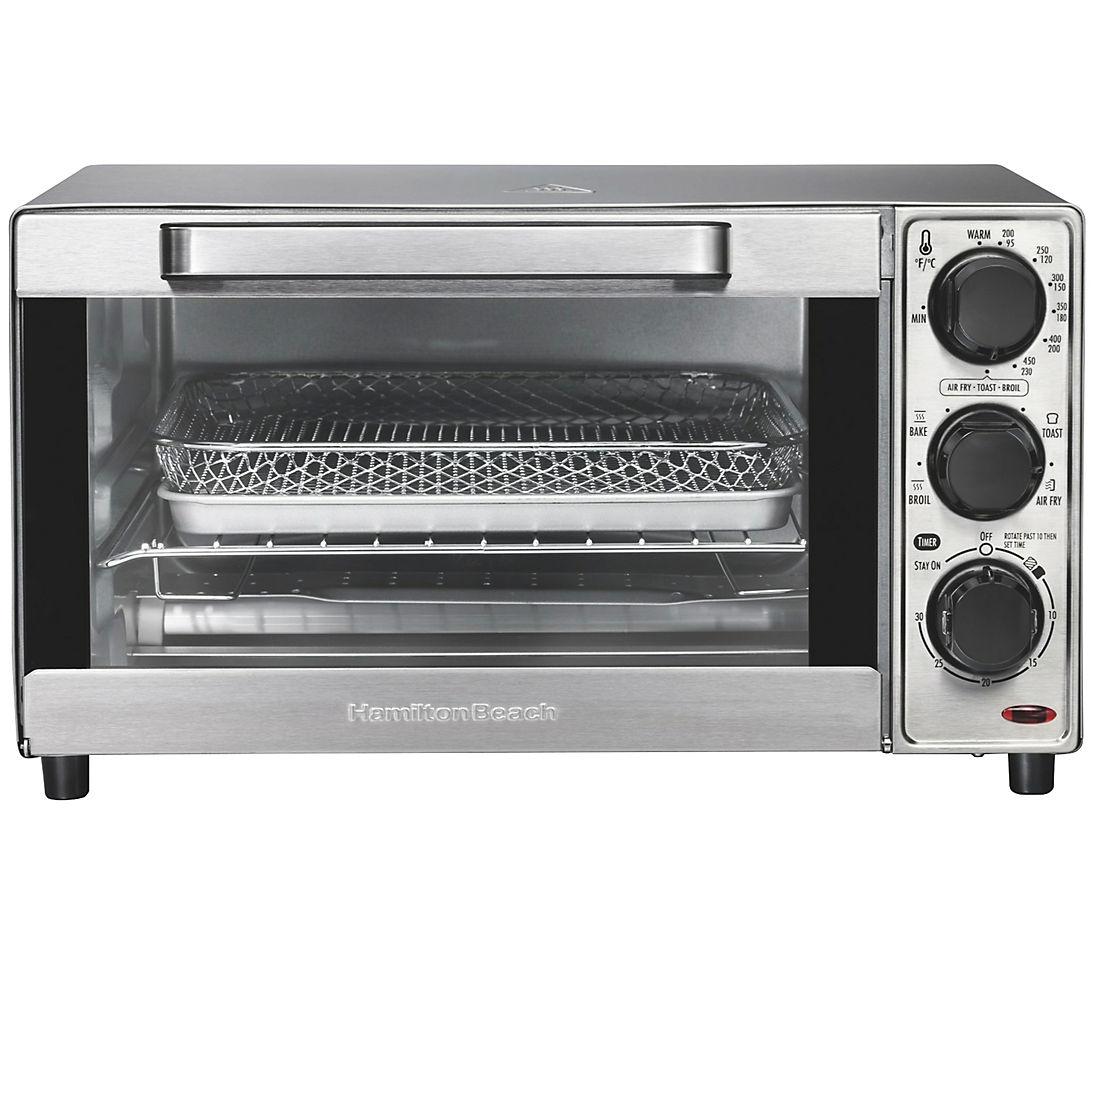 Hamilton Beach Sure Crisp 4 Slice Capacity Air Fryer Toaster Oven Bjs Wholesale Club